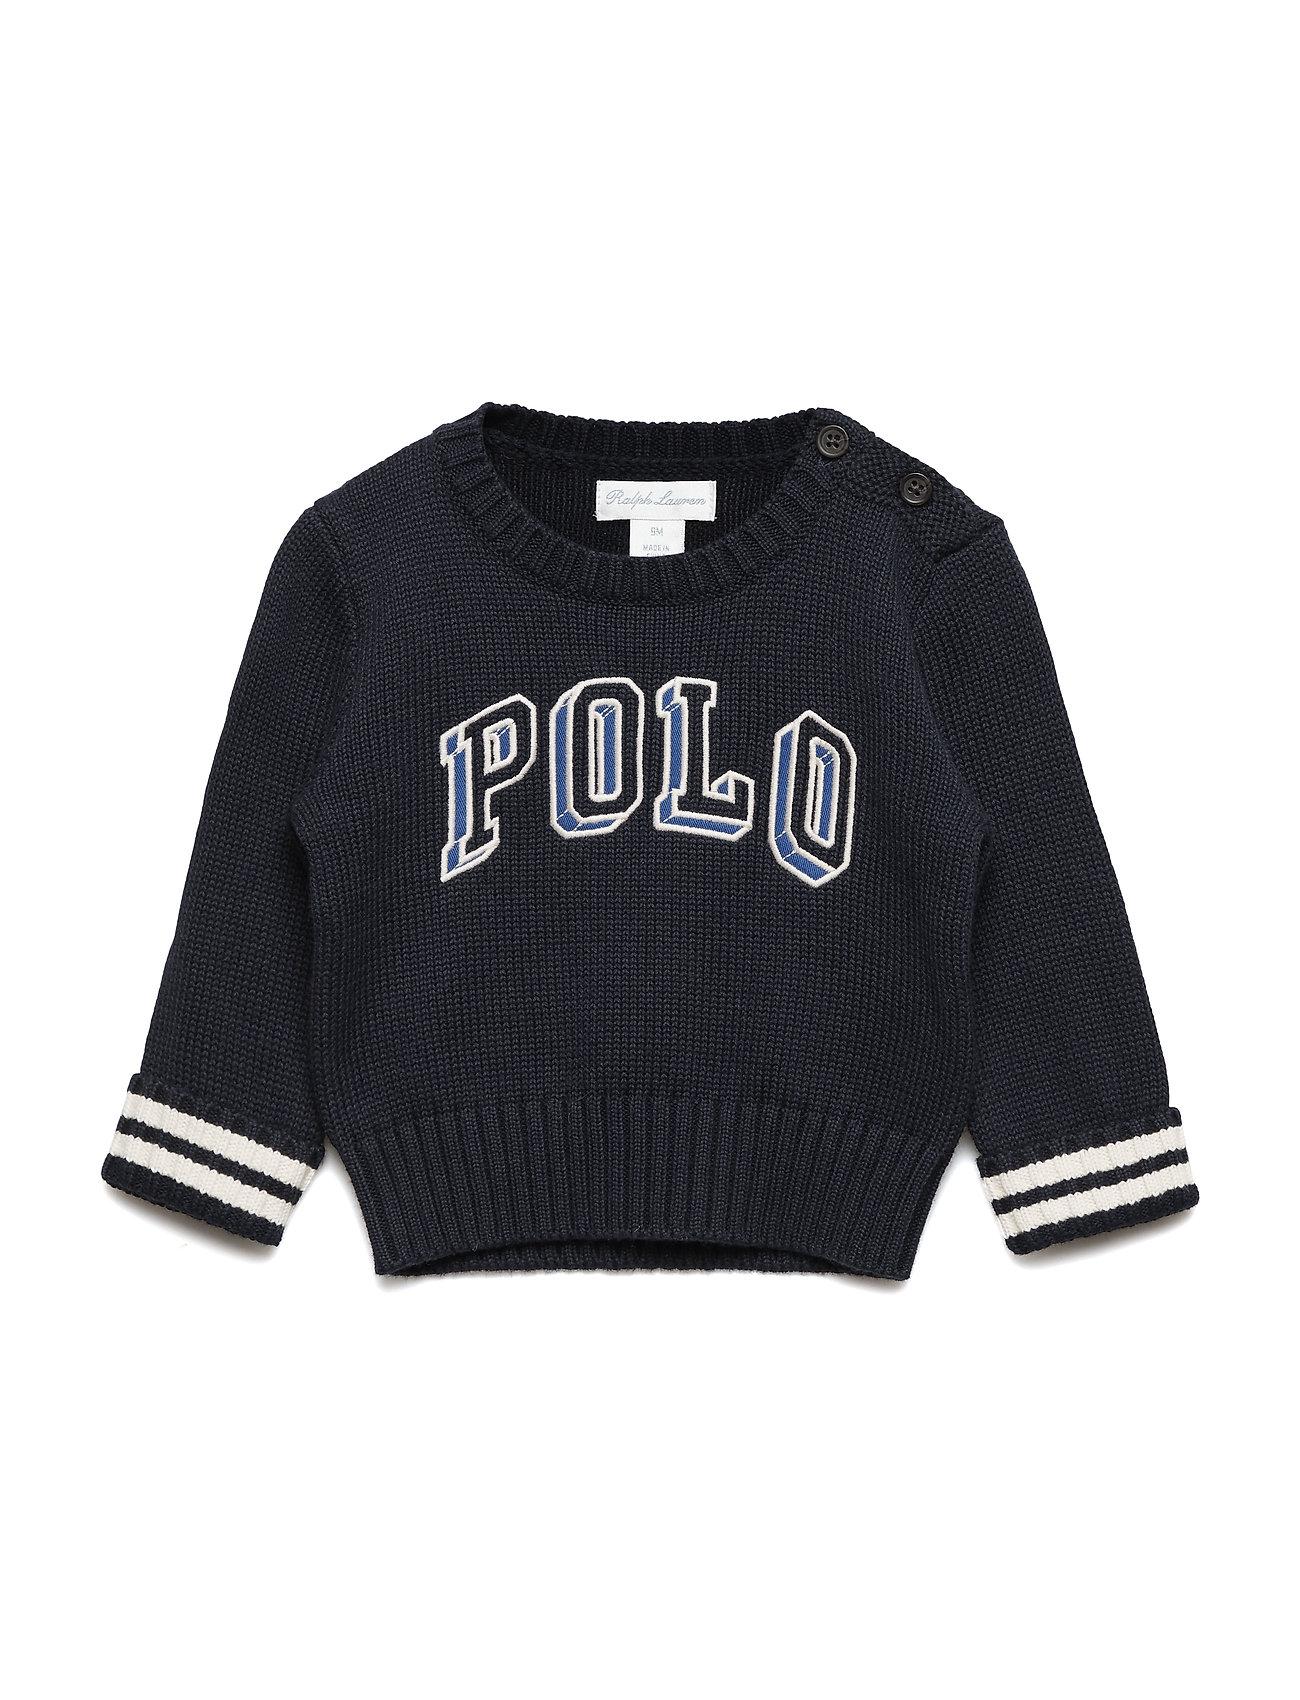 Ralph Lauren Baby Polo Cotton Crewneck Sweater - RL NAVY MULTI